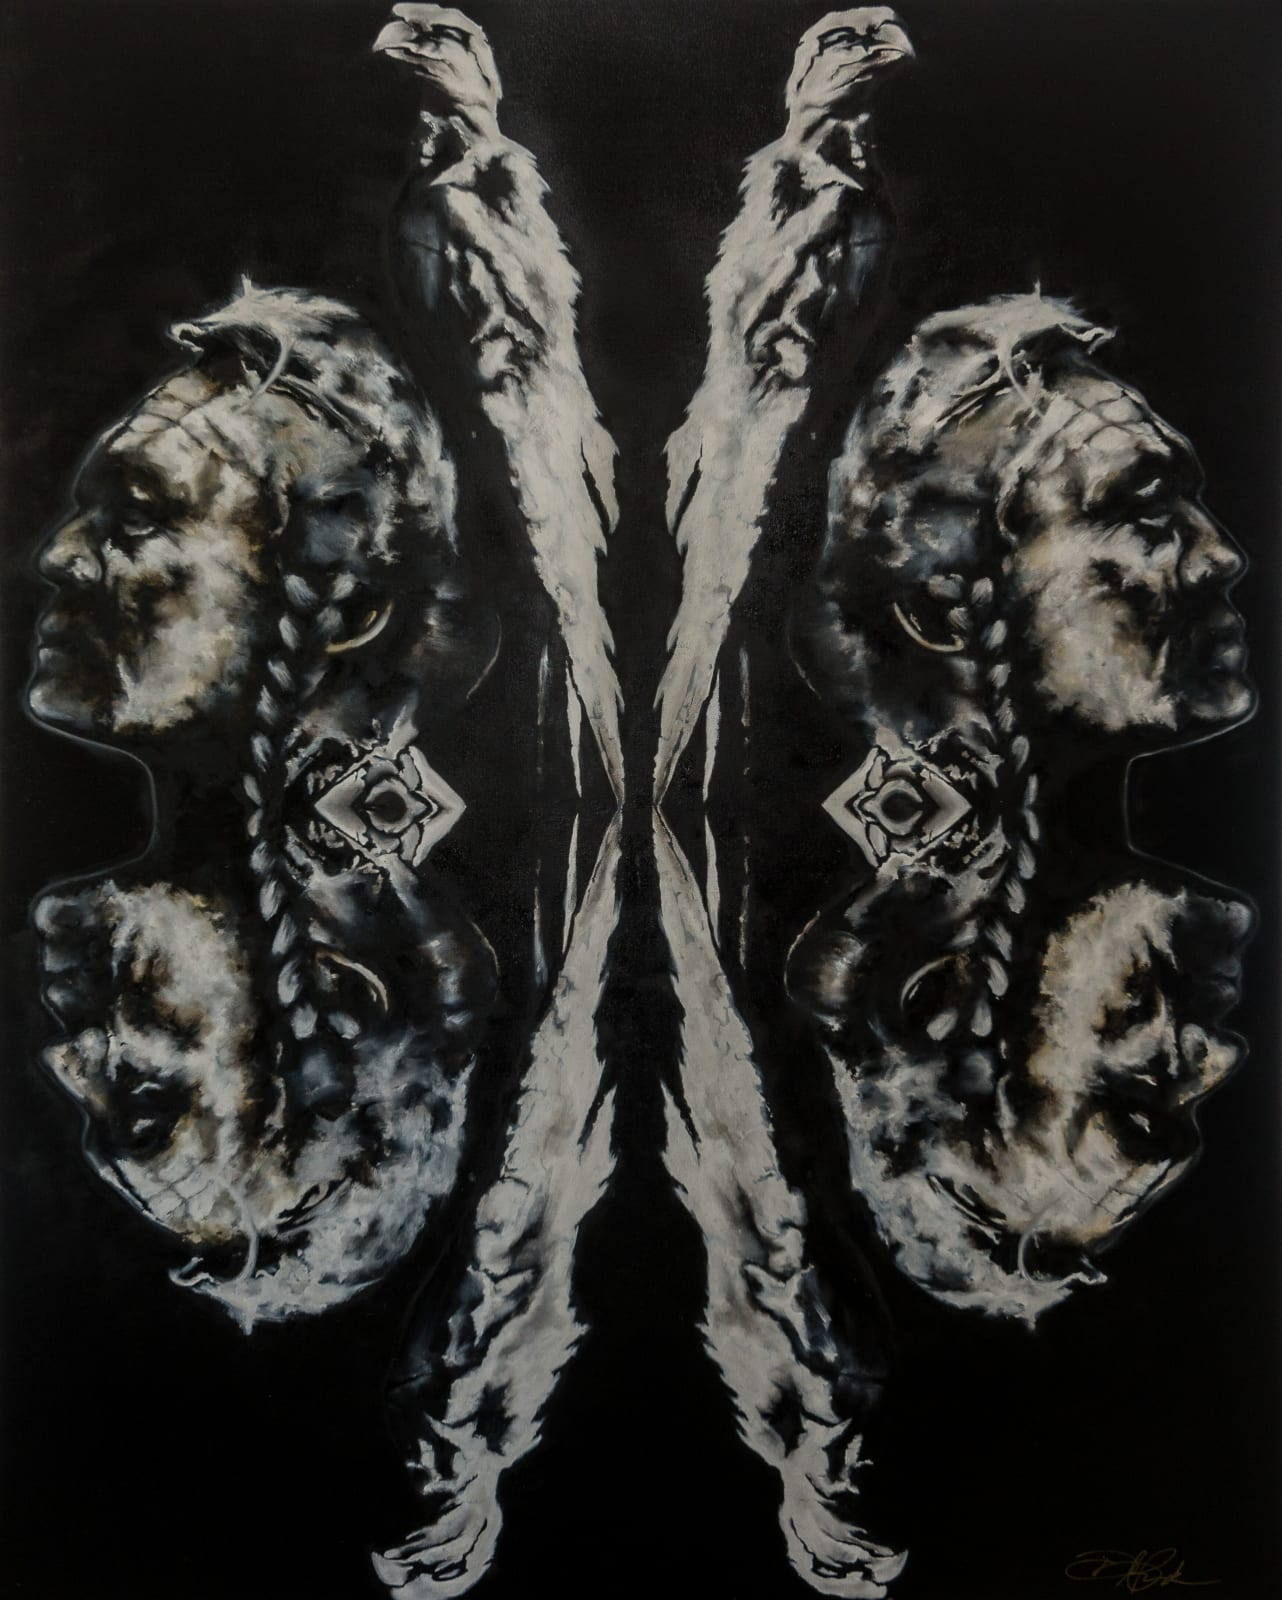 Dana Peska, Reflections